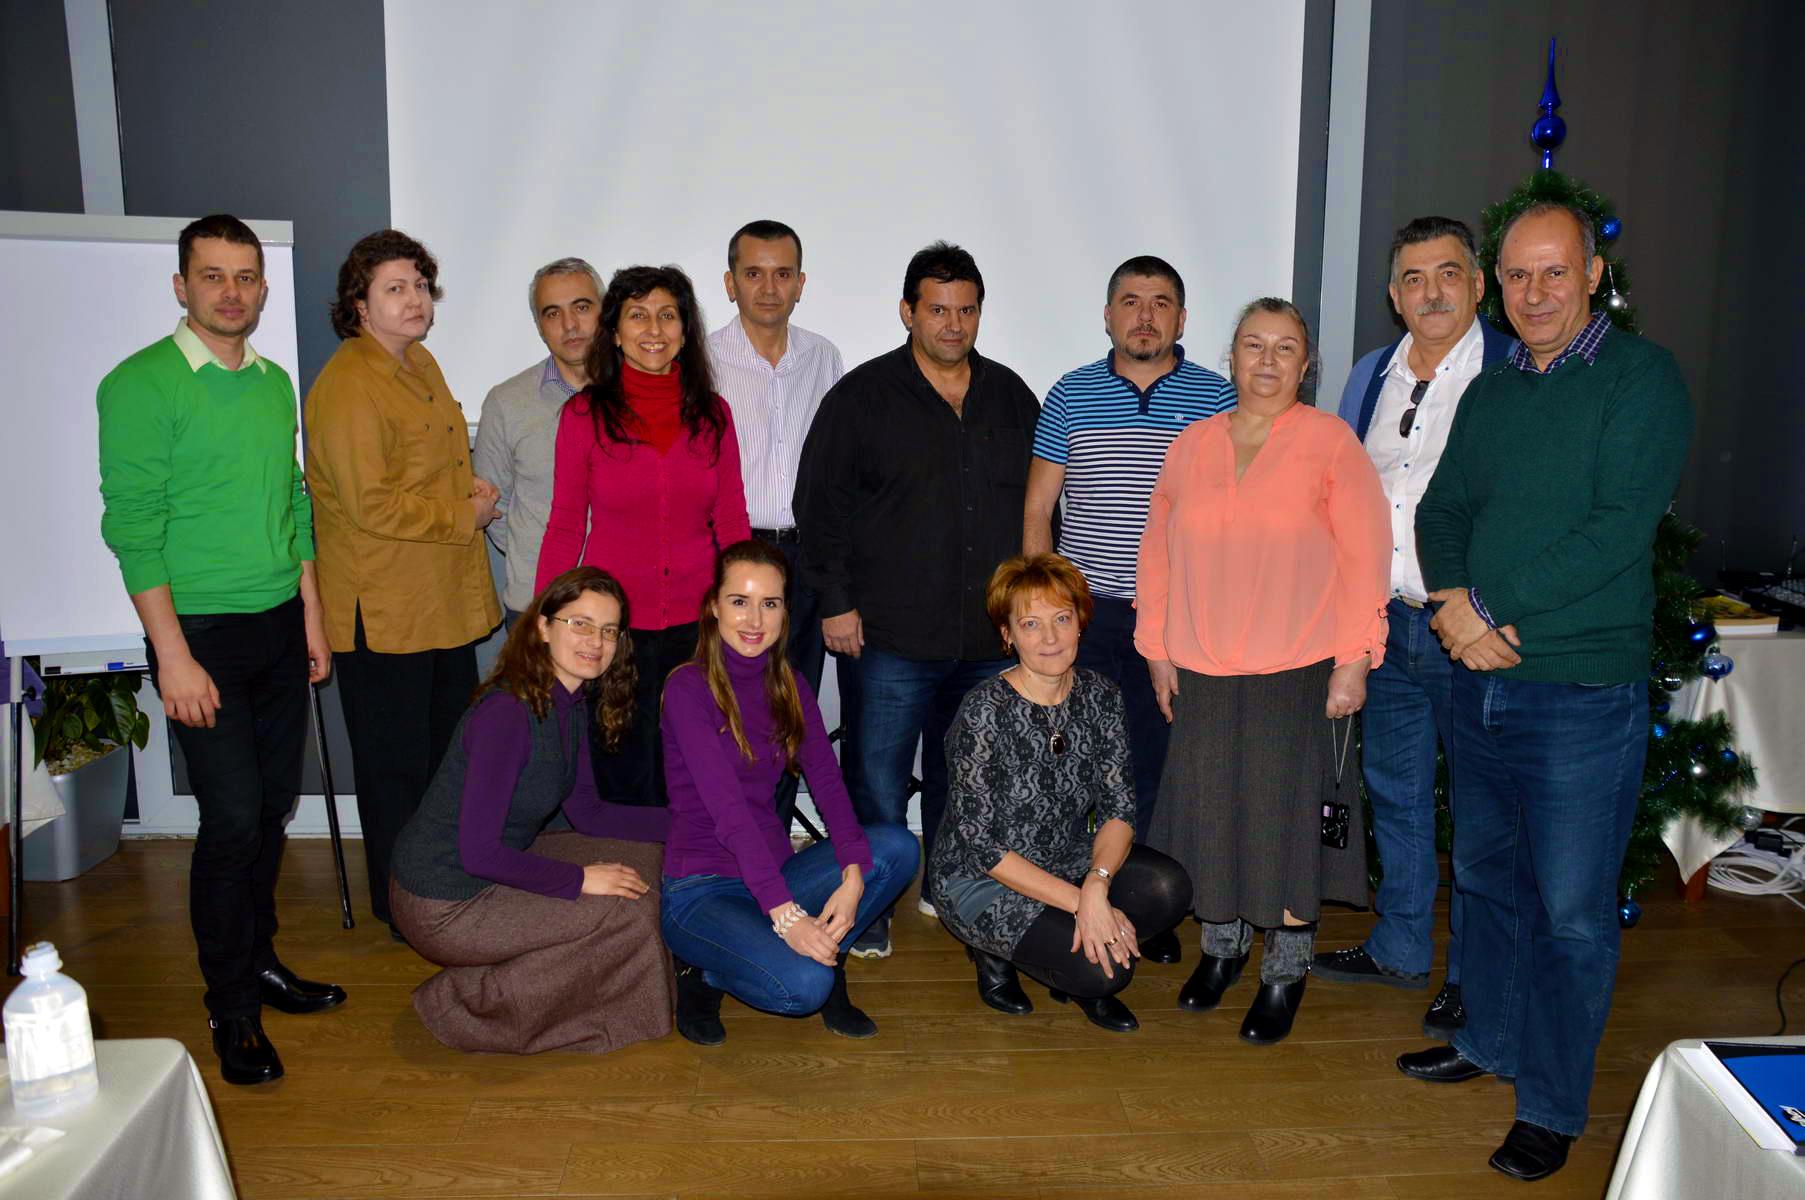 Poza de Grup, Curs Api-Chirurgie cu Dr Andrei Zbuchea